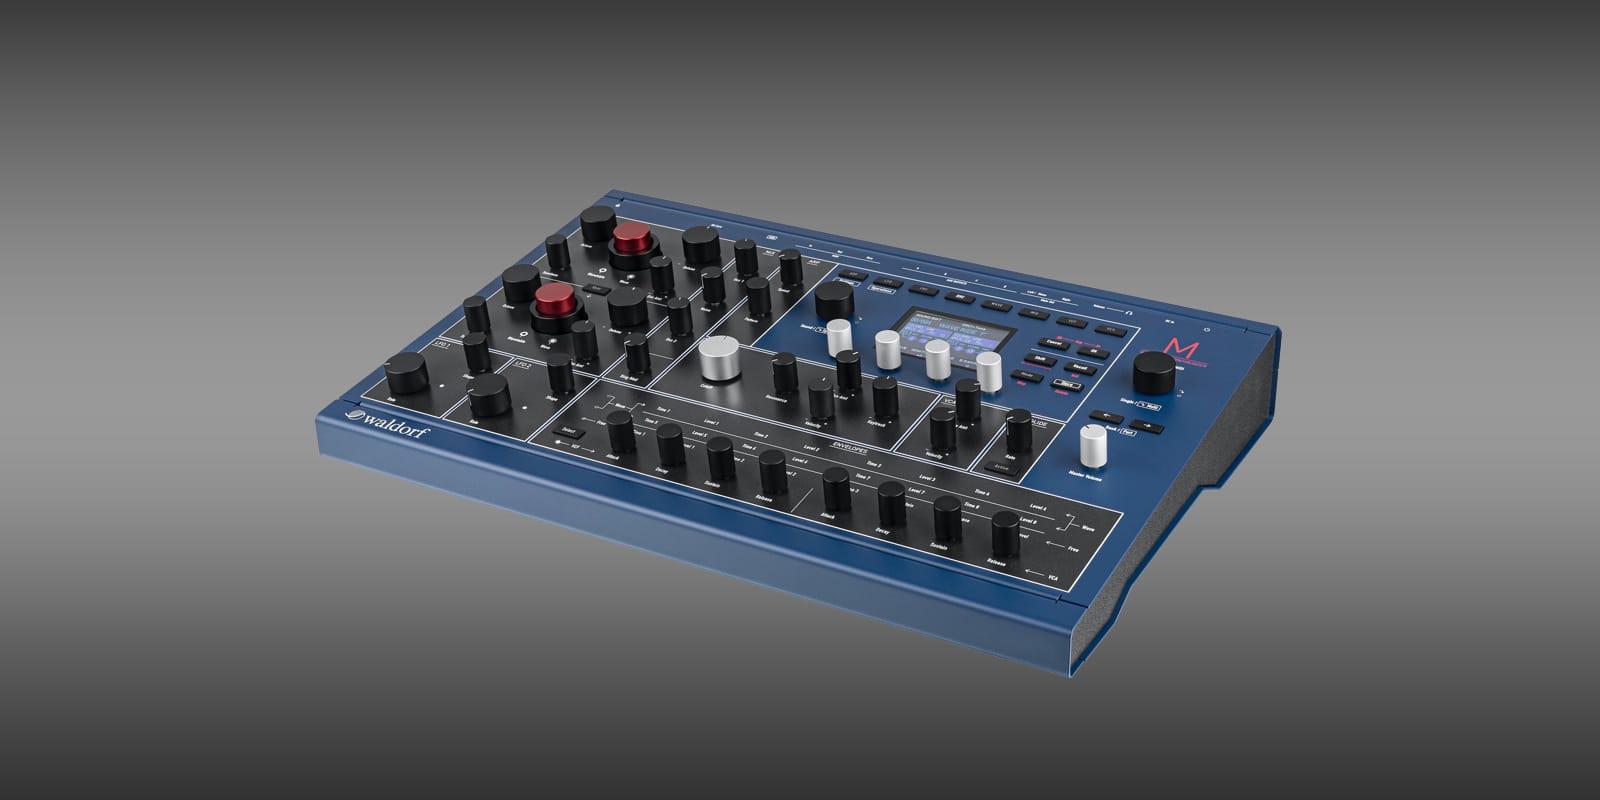 Waldorf new generation M wavetable synthesizer